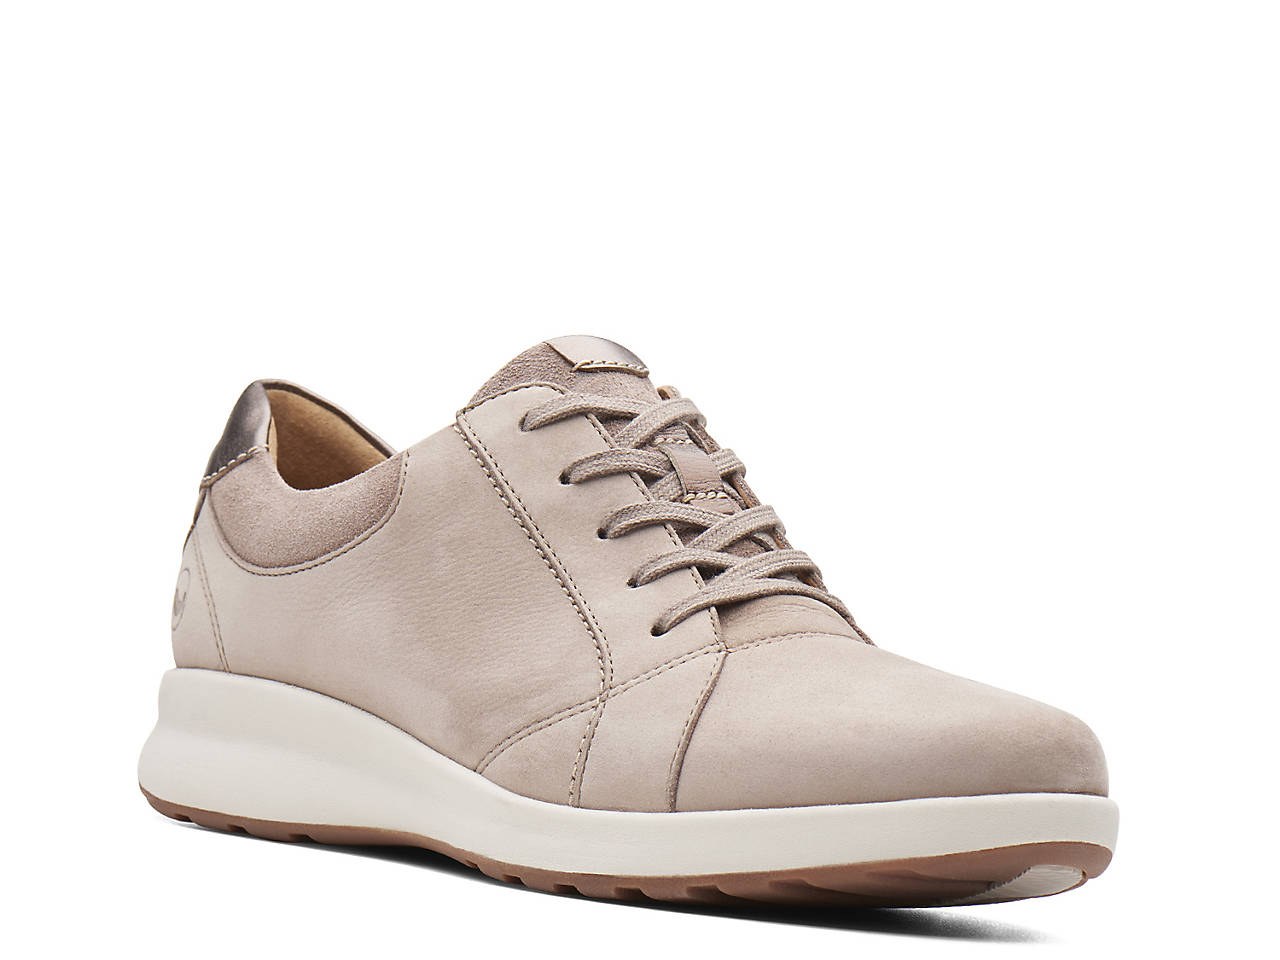 3ba381b8ea0e Clarks Un Adorn Sneaker Women s Shoes